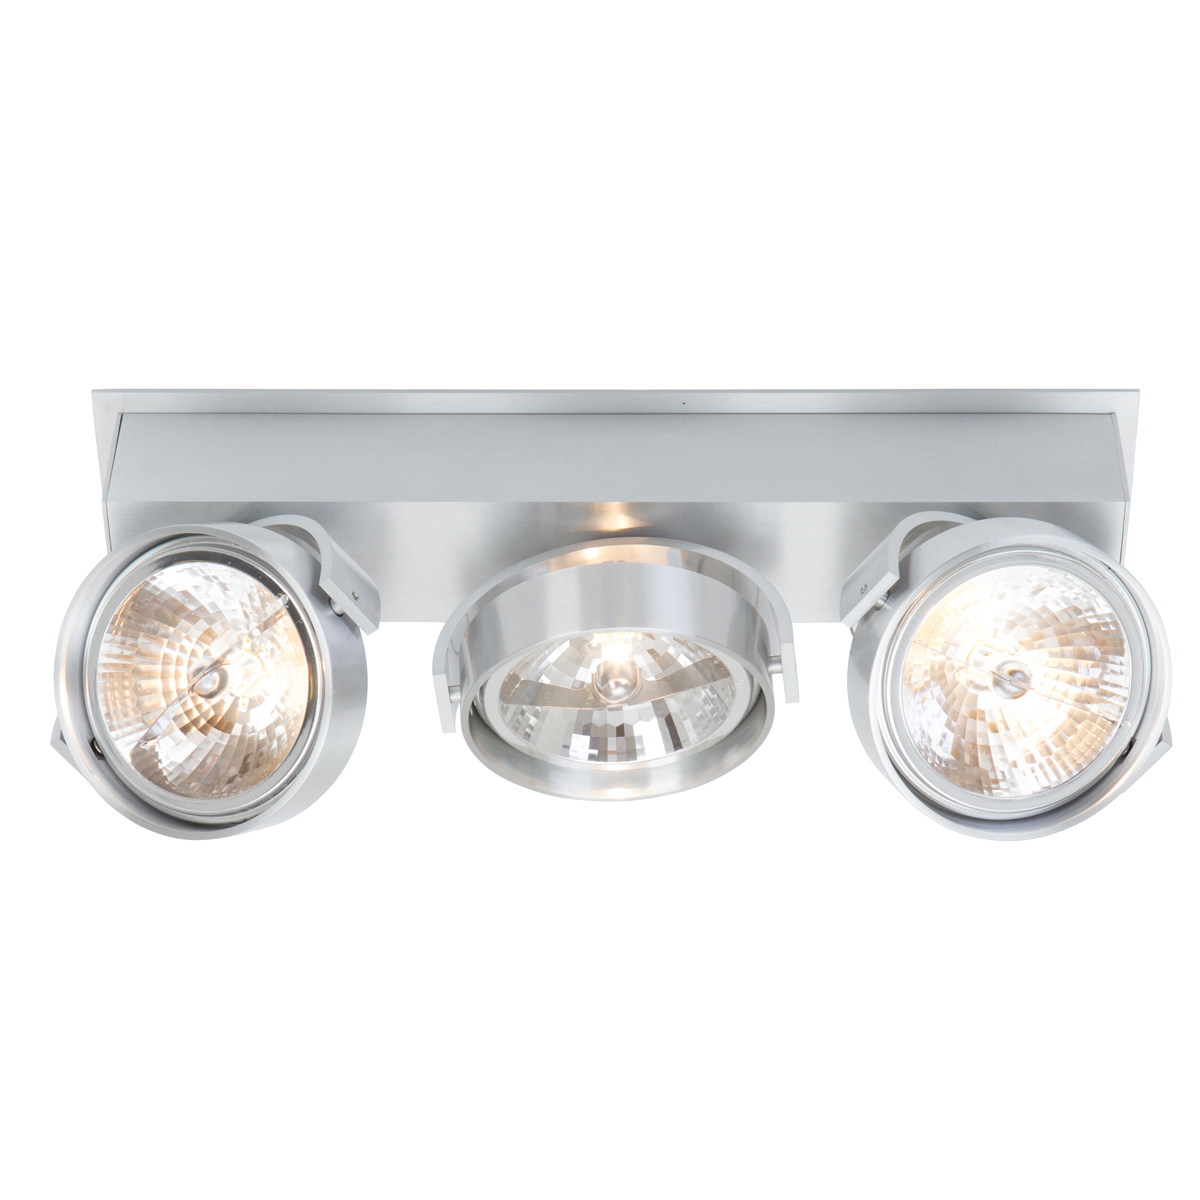 Stoere industriële spot 3 lichtpunten- Industriële lampen ...